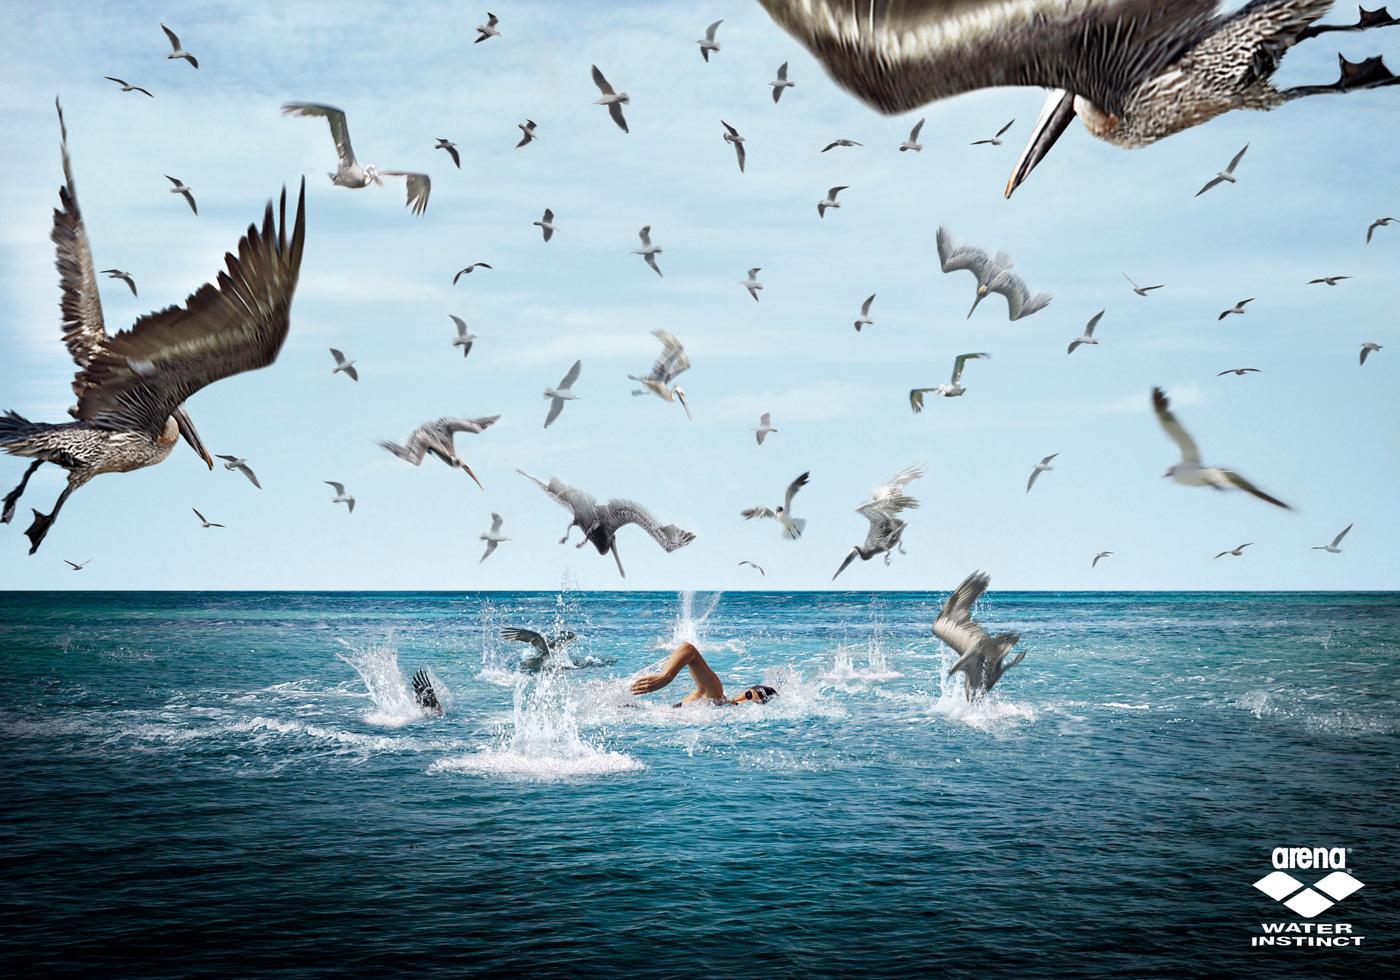 Arena Print Ad -  Birds